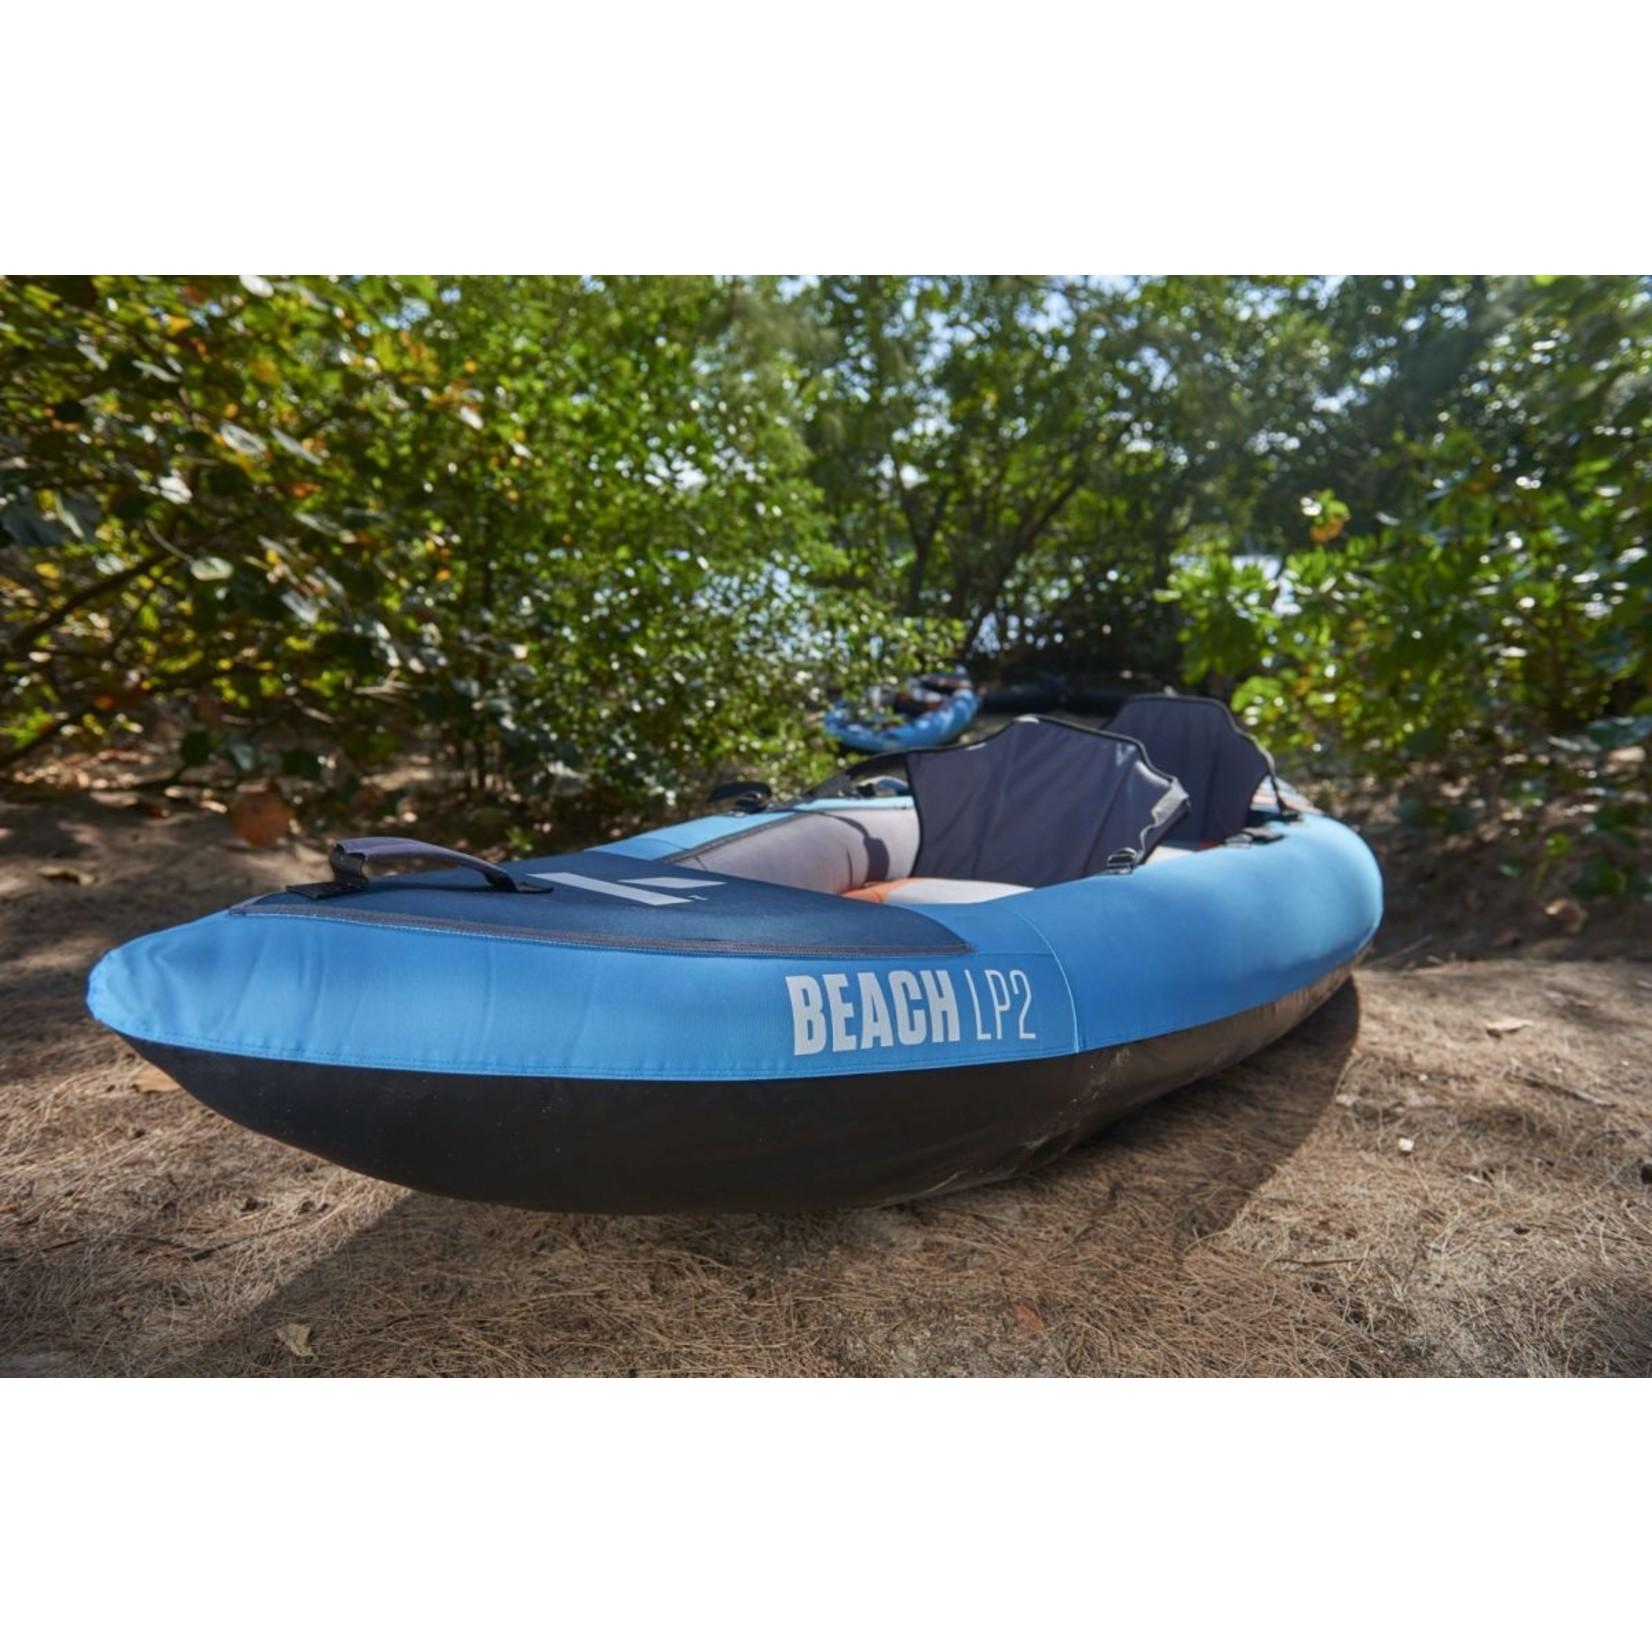 Tahe Beach Lp2 Inflatable Kayak